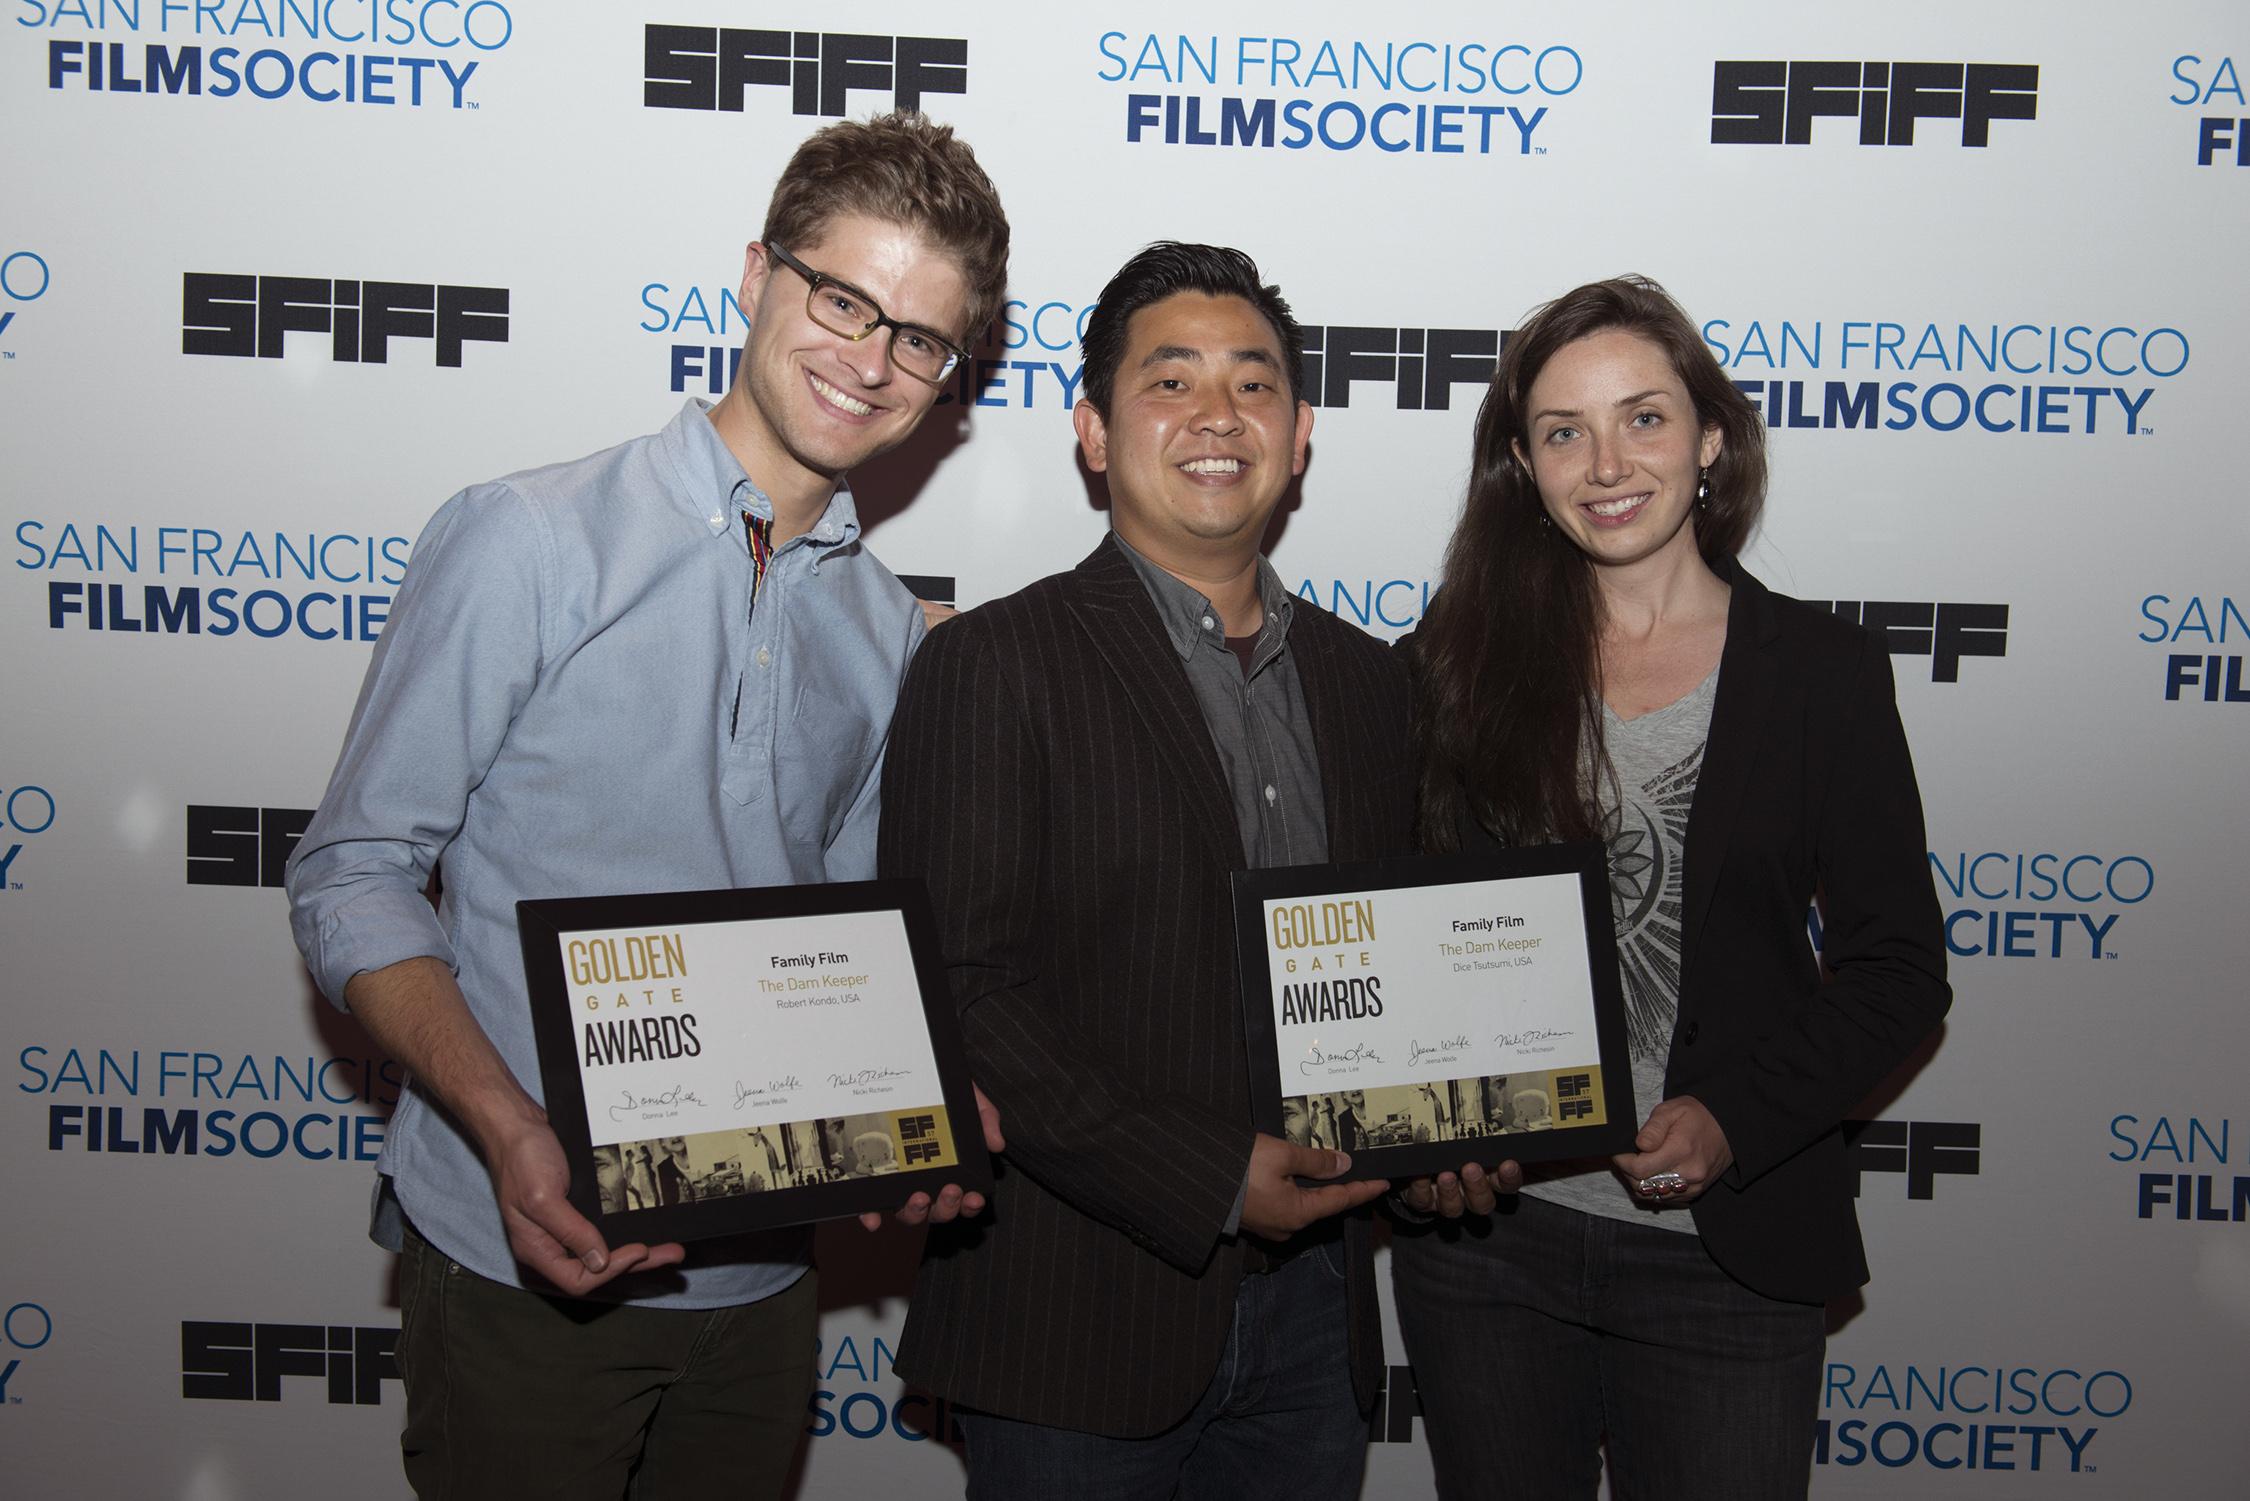 Director Robert Kondo, director Dice Tsutsumi and producer Megan Bartel of THE DAM KEEPER